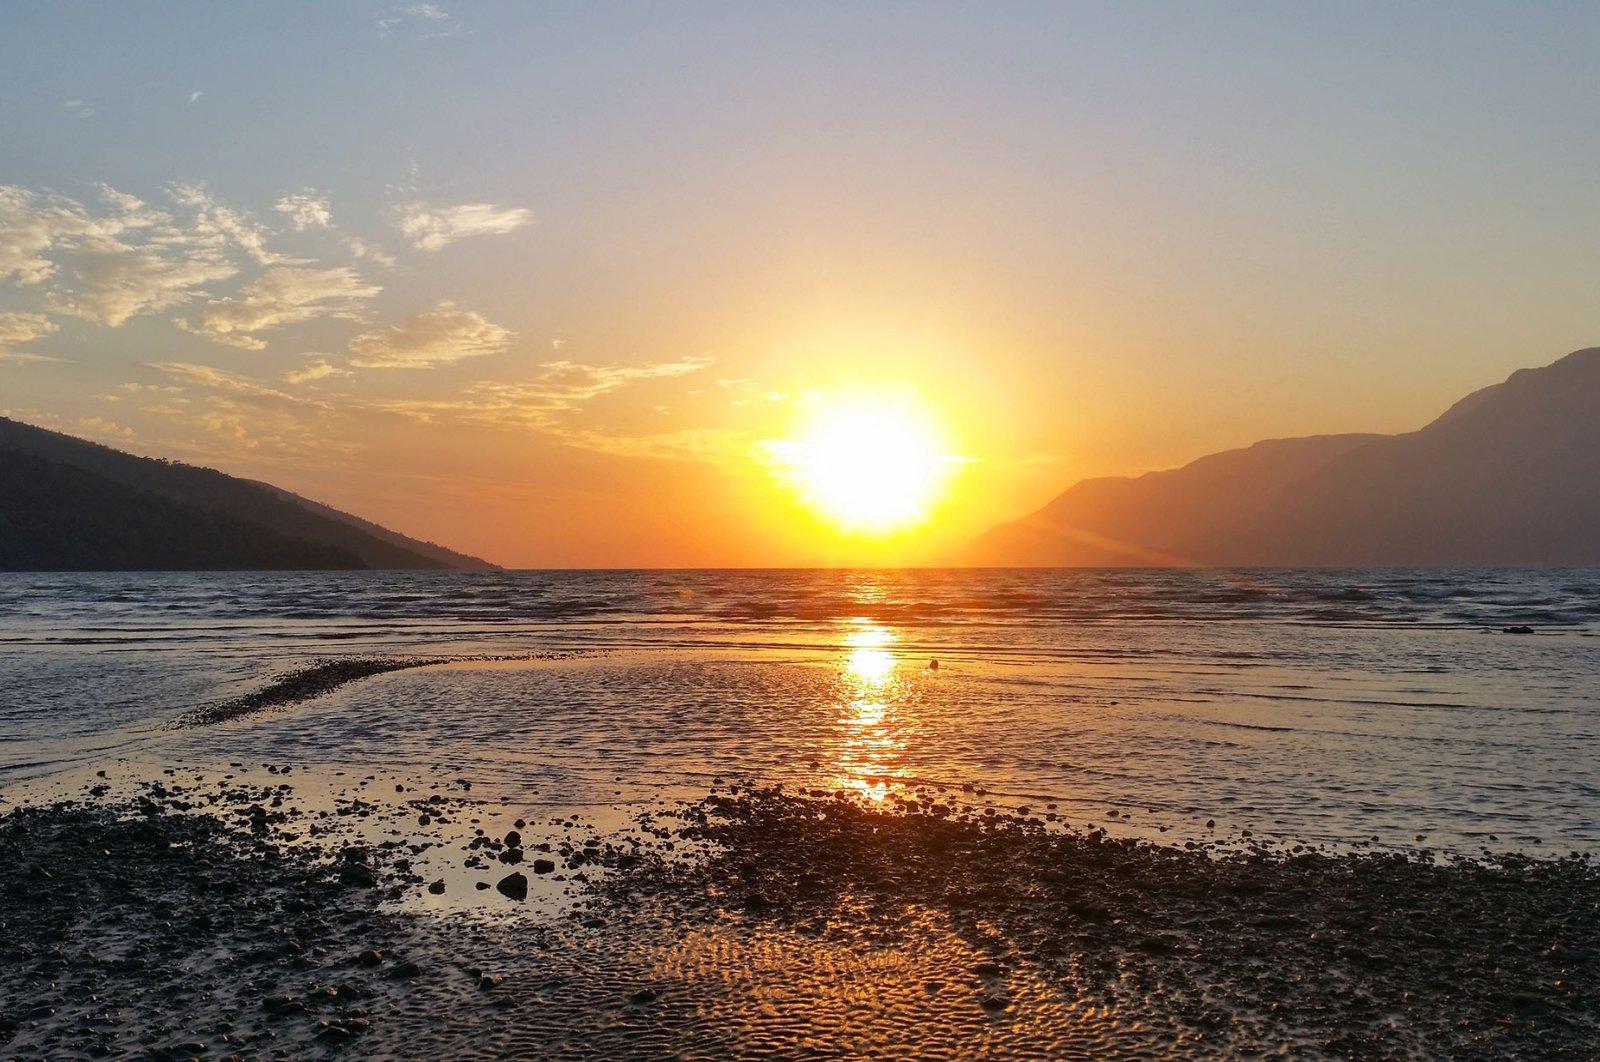 The warm sunset is a sight to behold at Akyaka's kitesurf beach in Muğla, southwestern Turkey. (Shutterstock Photo)